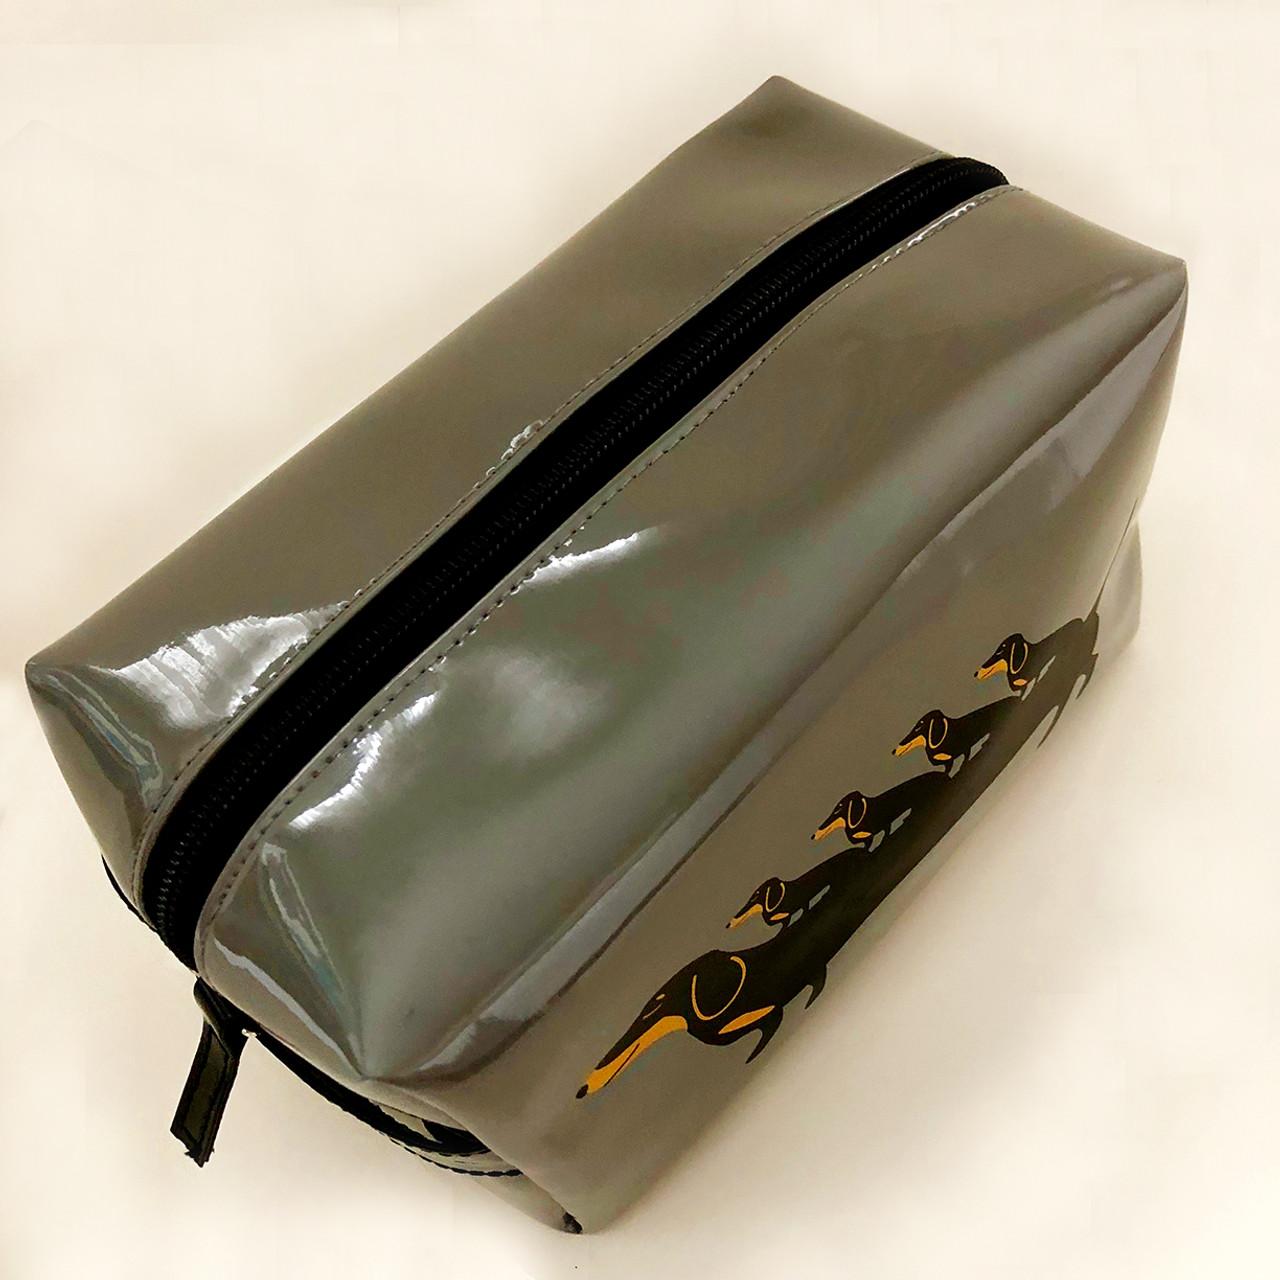 Dachshund Toiletry Travel Bag